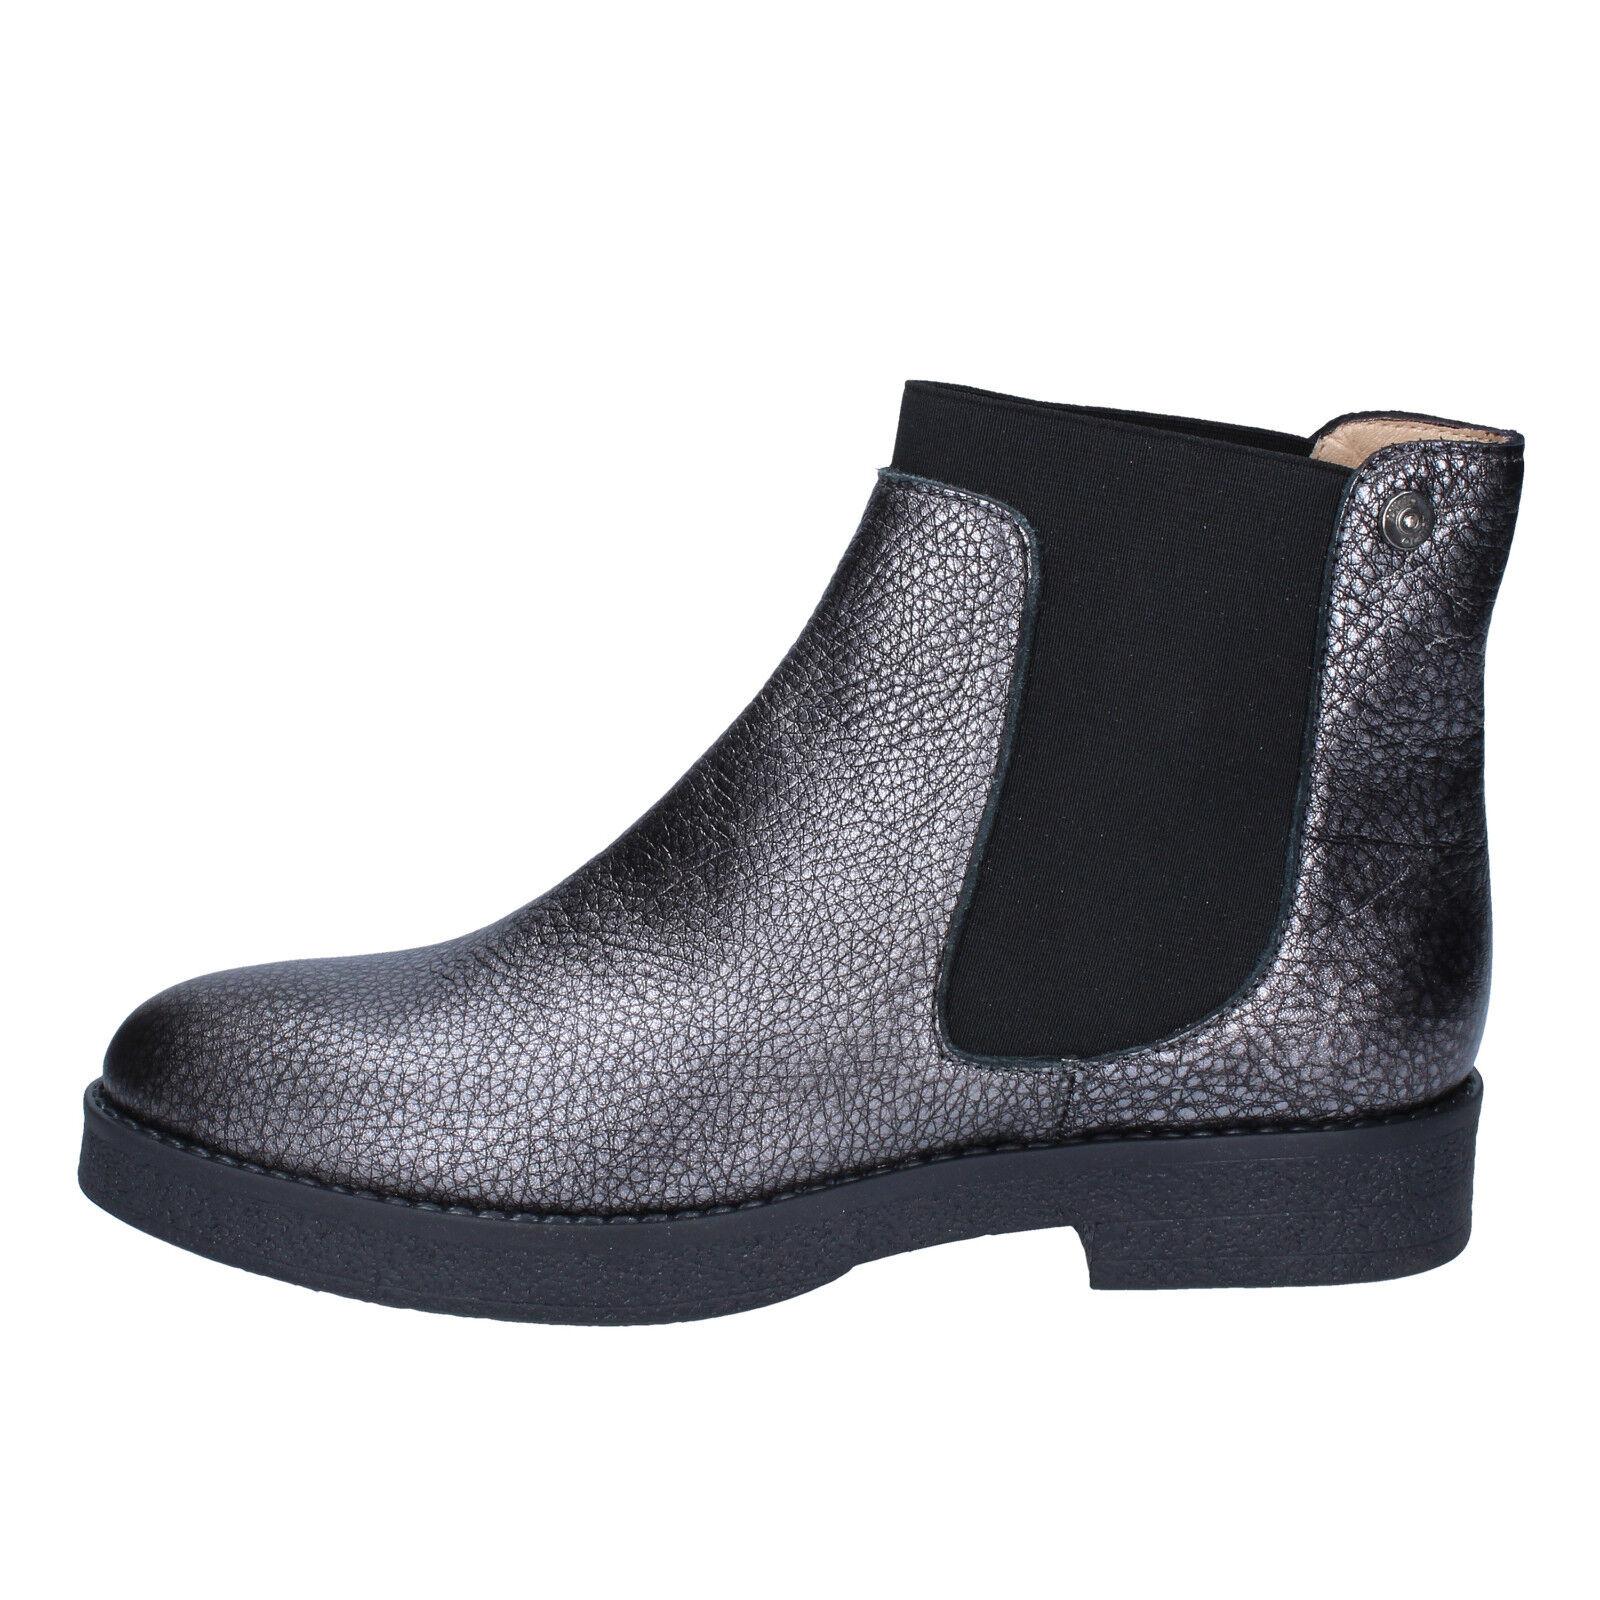 scarpe donna LIU JO 39 EU stivaletti grigio pelle BY592-39